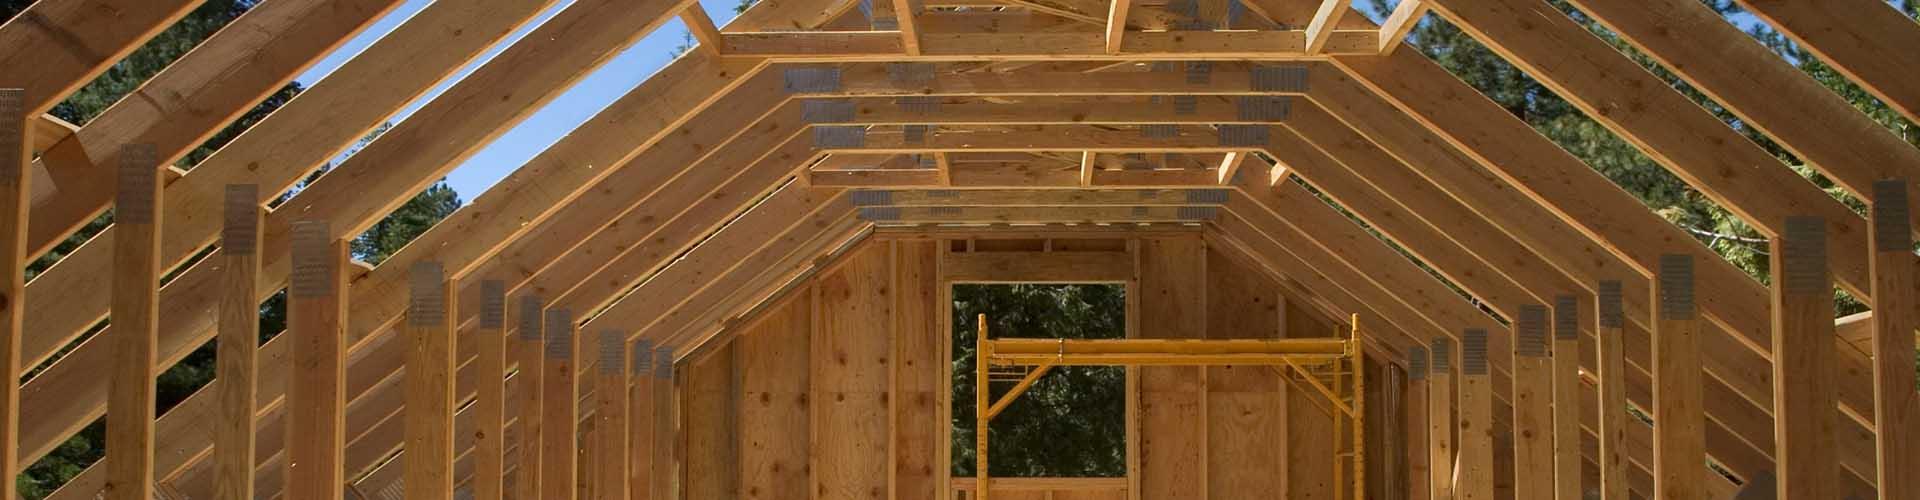 Roof Trusses Floor Joists Glulam Beams Laminated